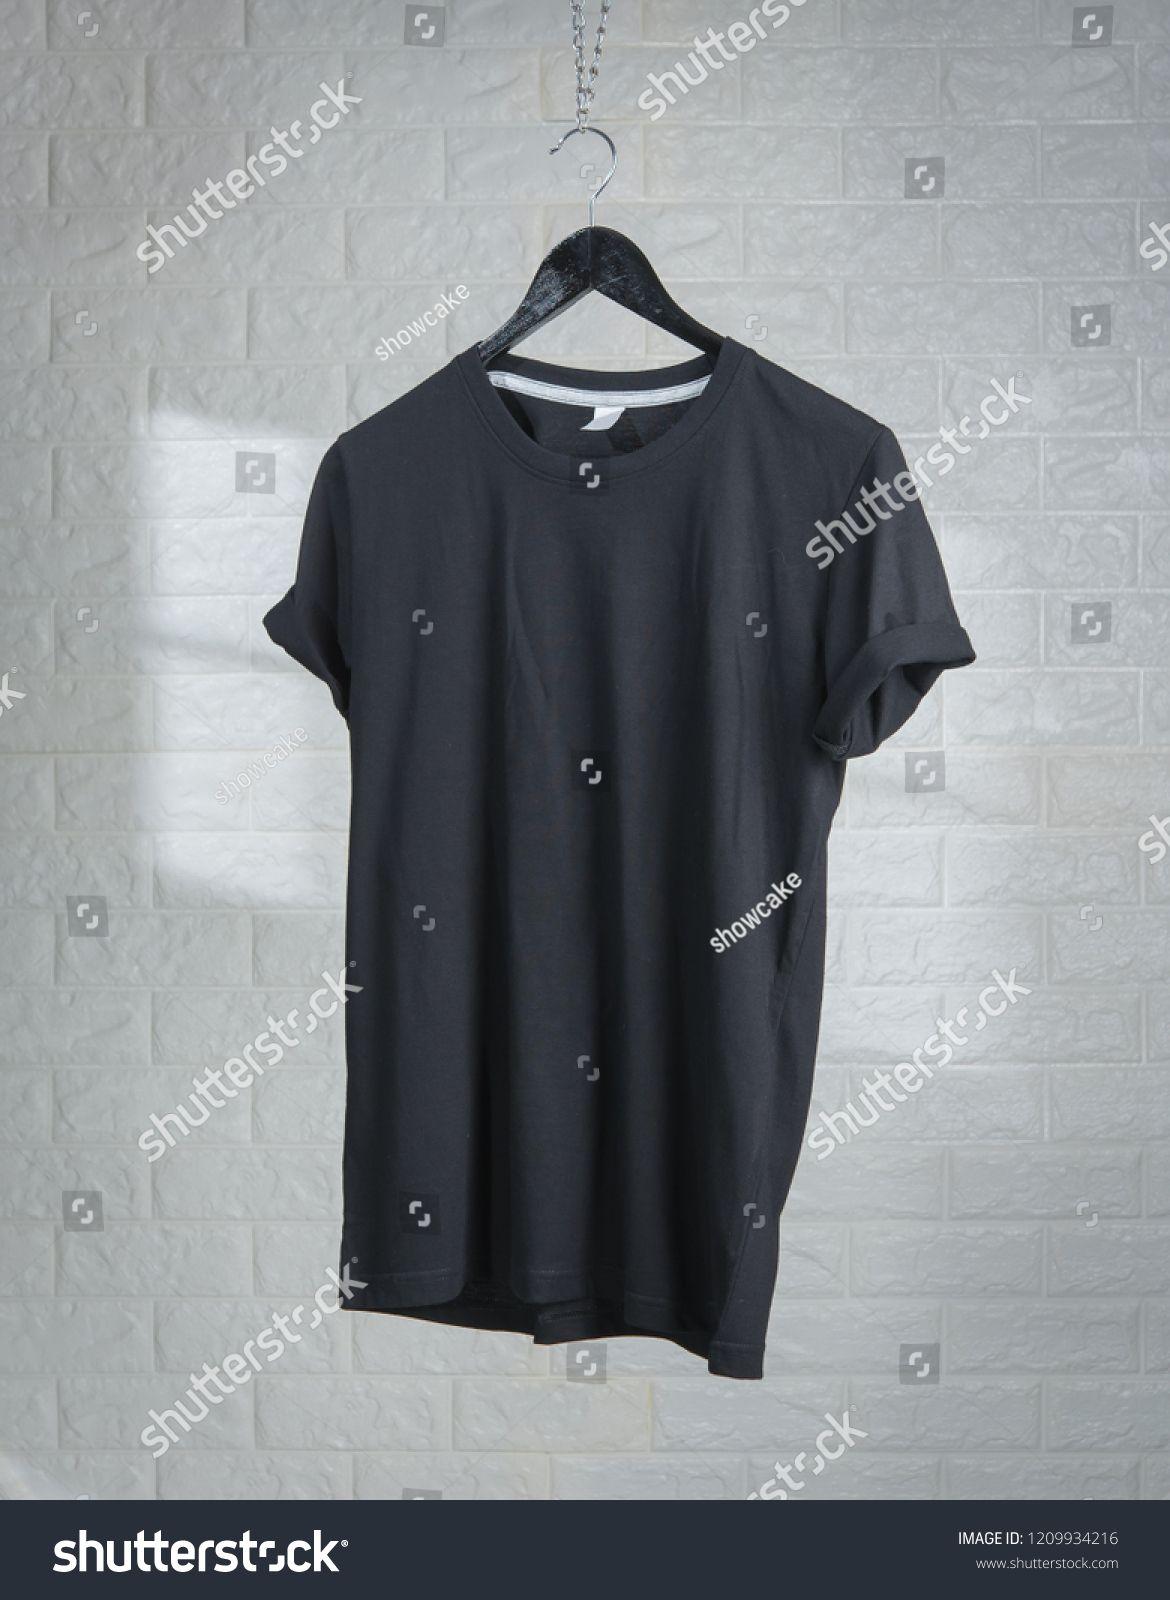 1800+ T Shirt Mockup Shutterstock Mockups Builder